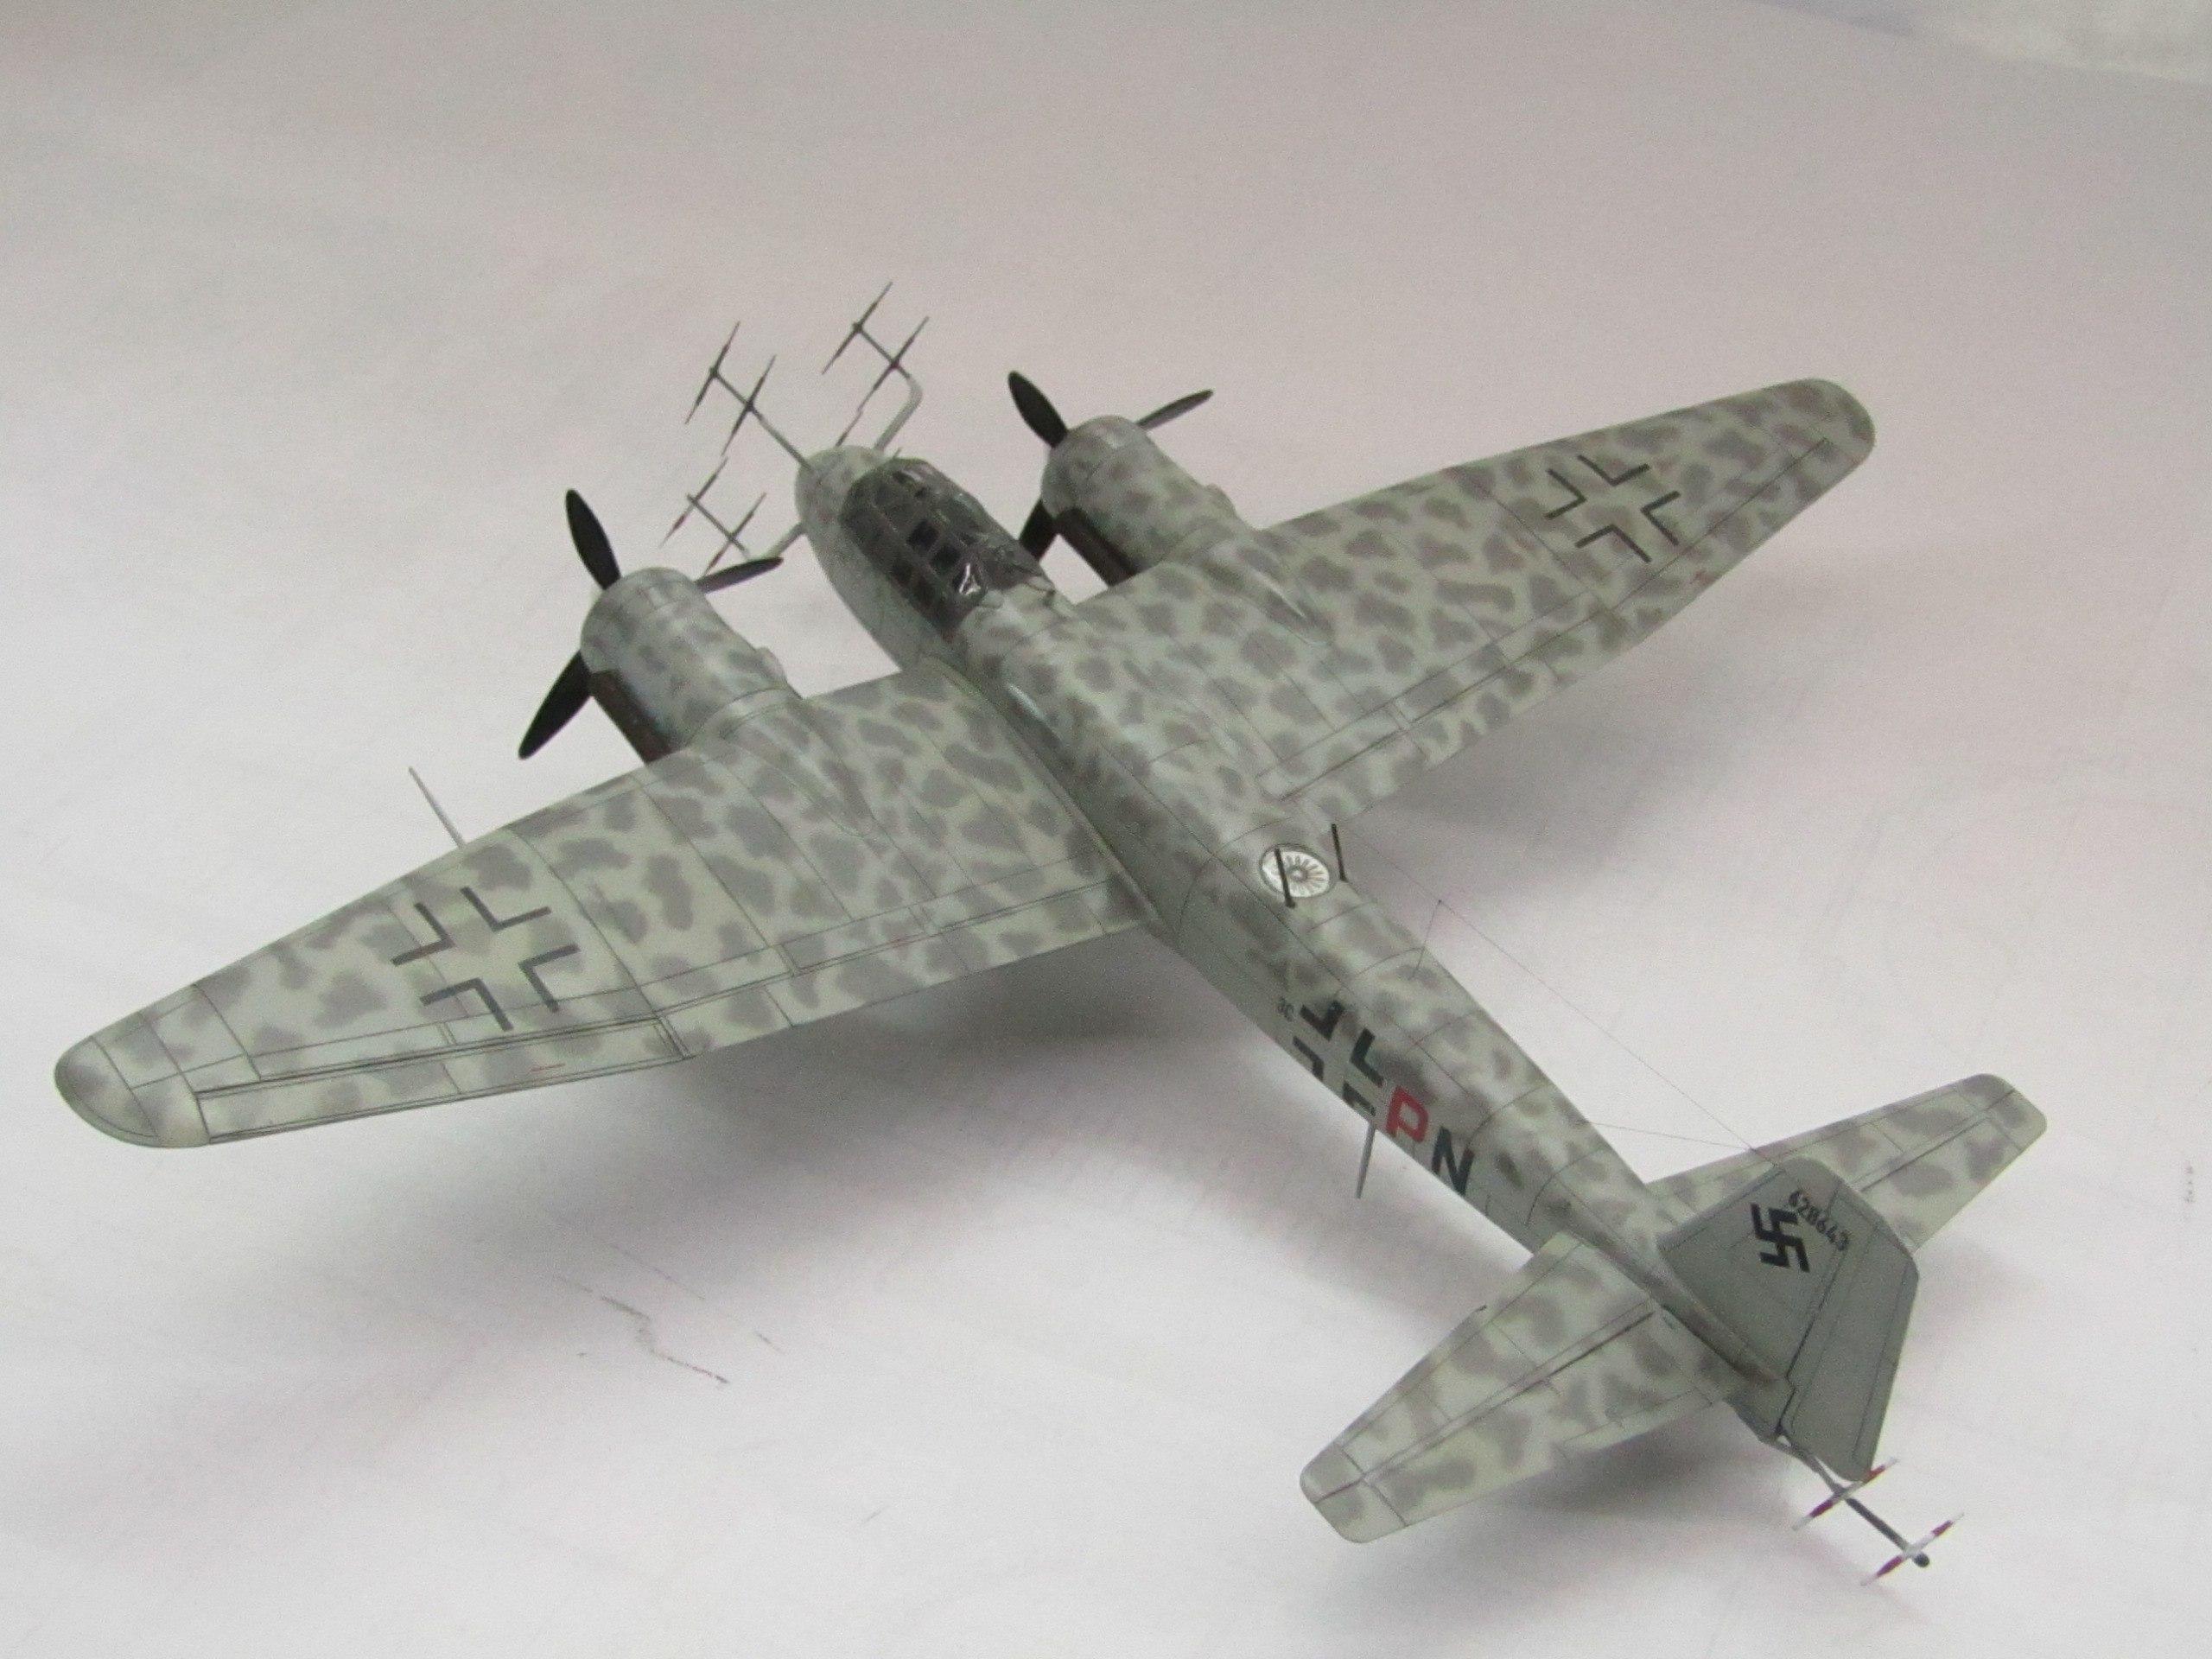 Ju-88 G-6 1/72 (Звезда) 8VV2xgJpocs